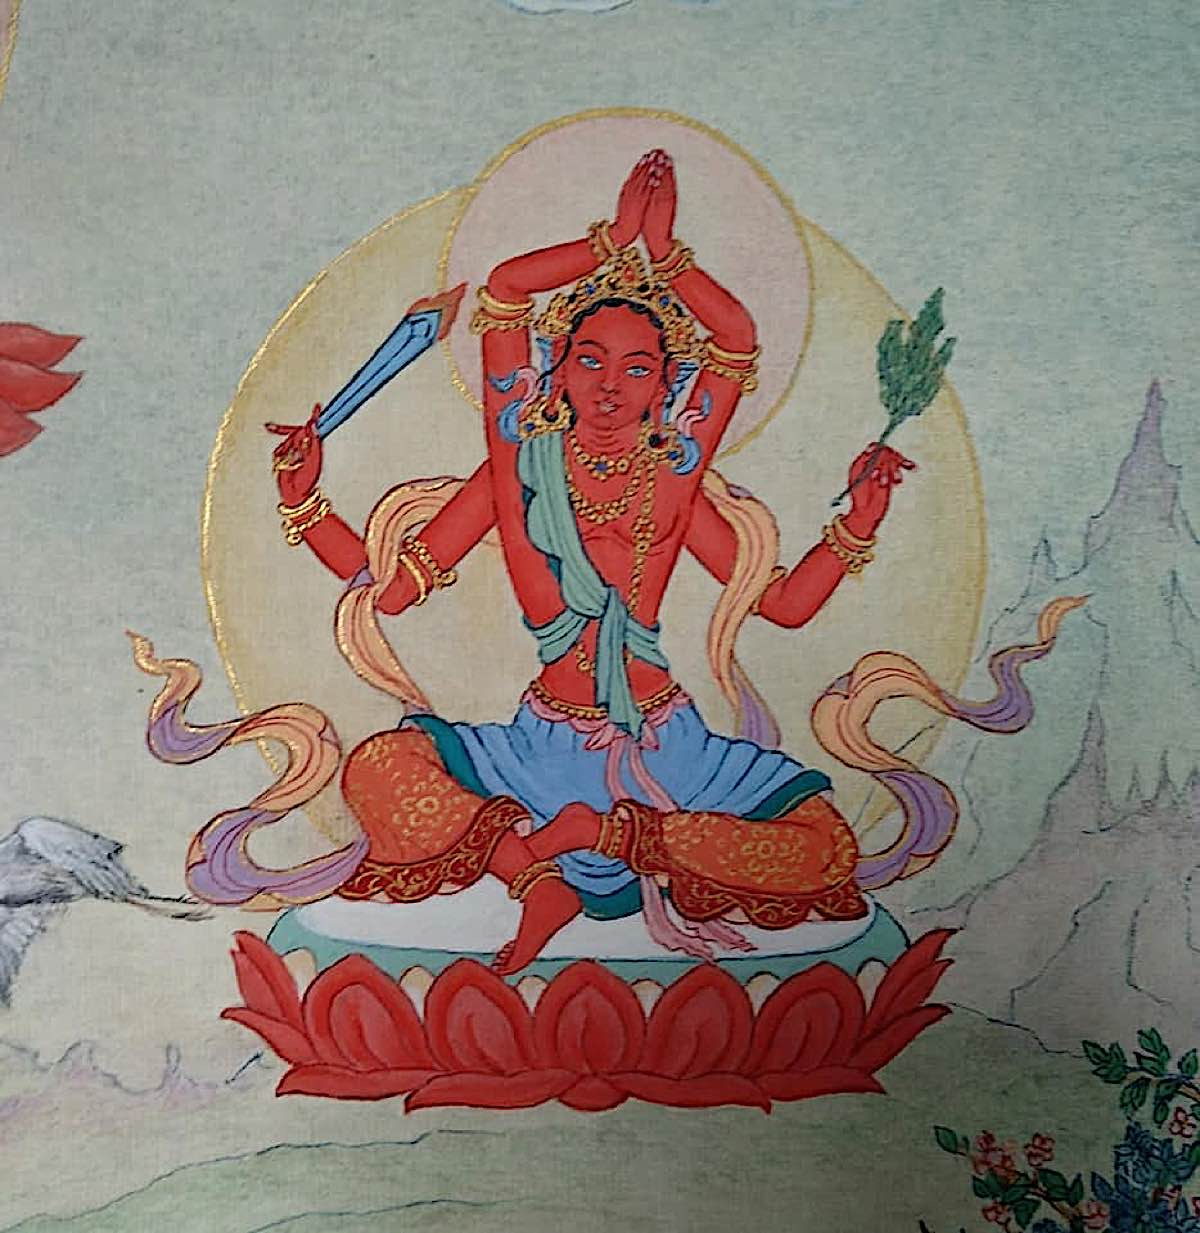 Buddha Weekly 10 Tara Dispelling All Sorrow Shoka Vinodana Tara 21 Taras Thankha by Angeli Lhadripa Shkonda Buddhism